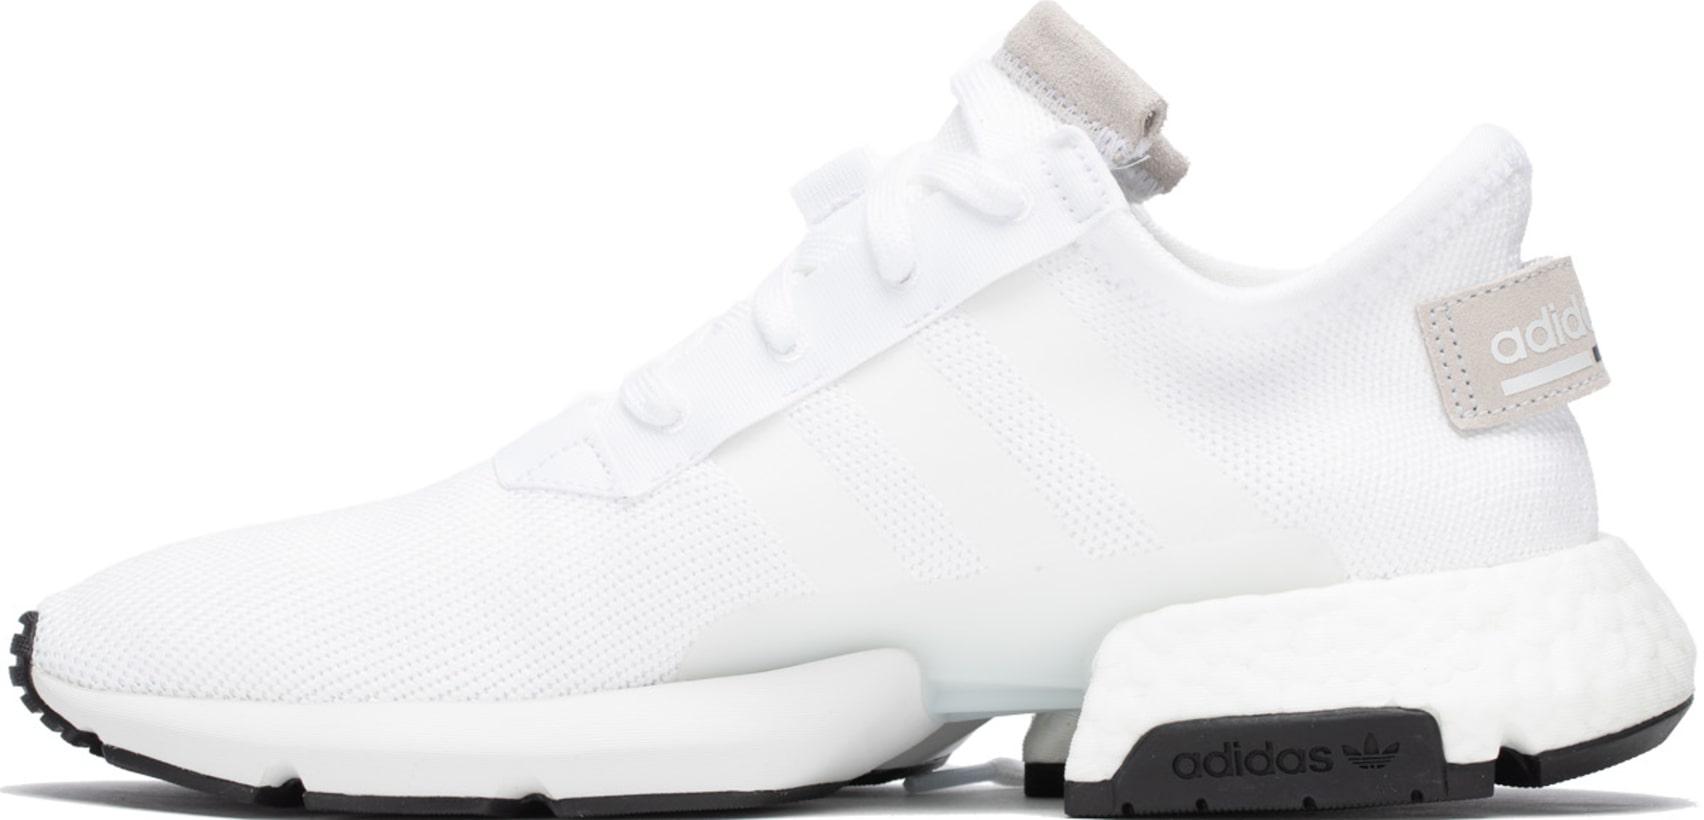 buy popular dc5e8 c0b2d adidas Originals  Pod-S3.1 - Cloud White Cloud White Core Black   influenceu